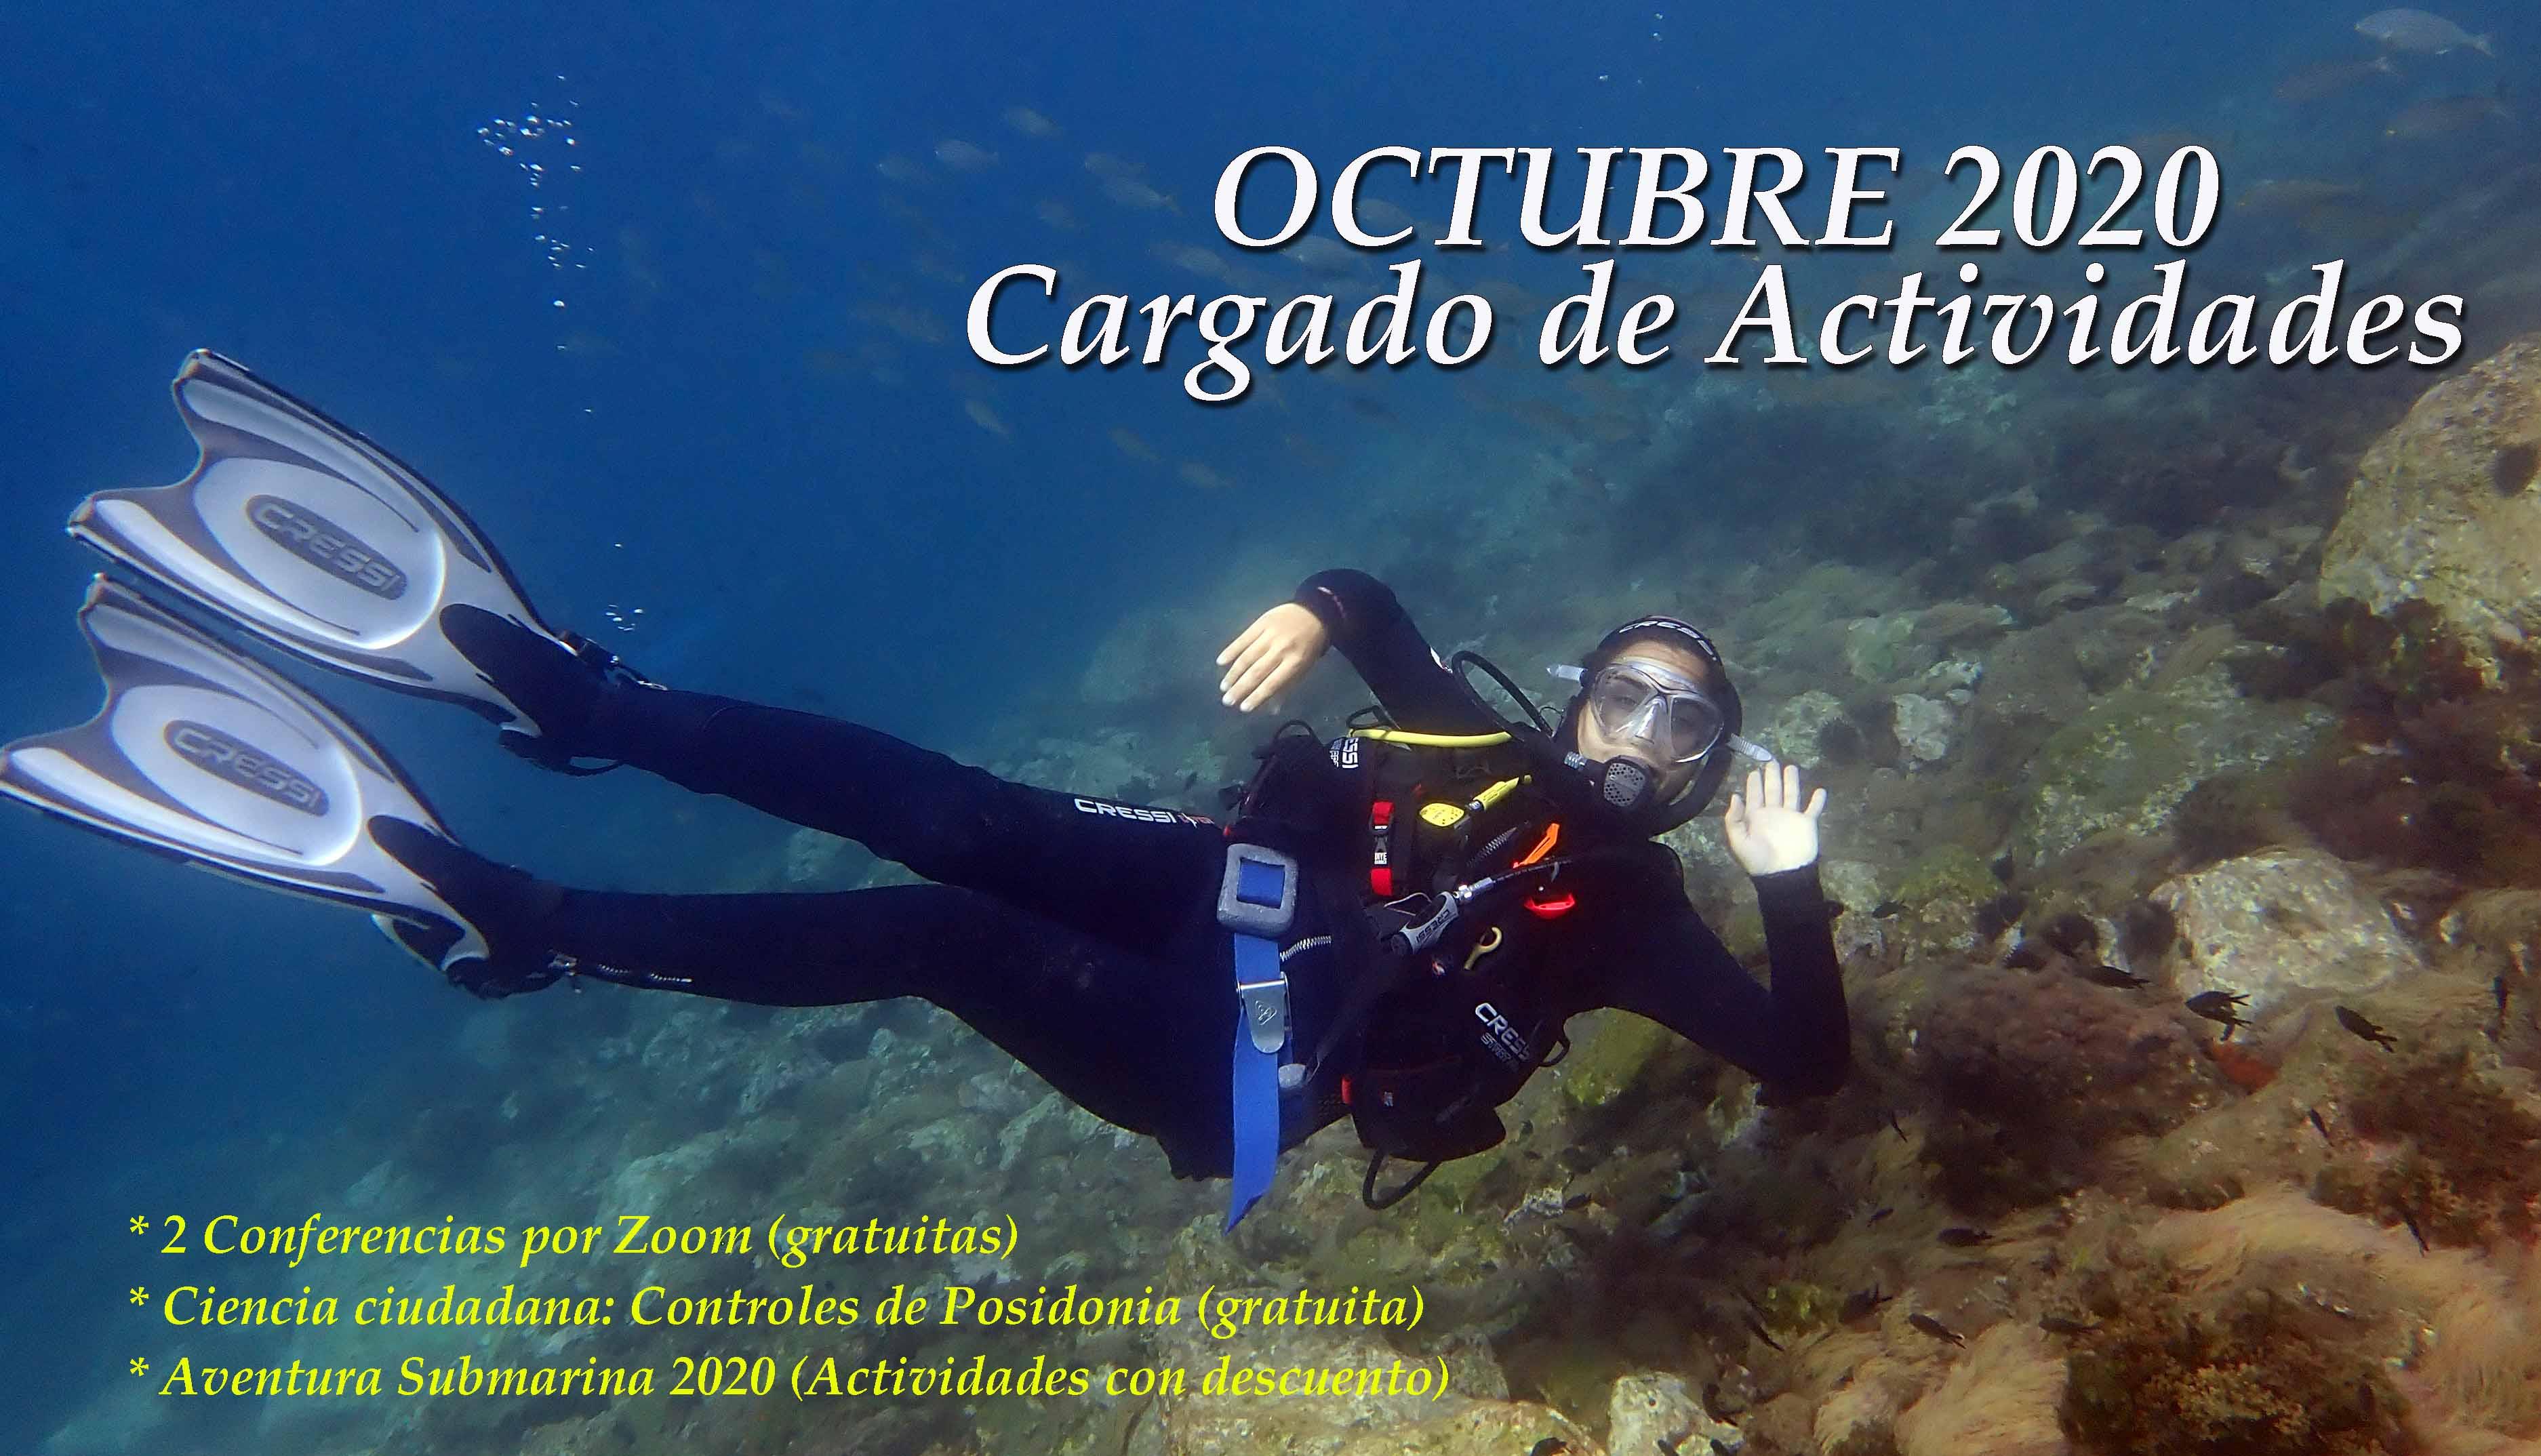 OCTUBRE CARGADO DE ACTIVIDADES